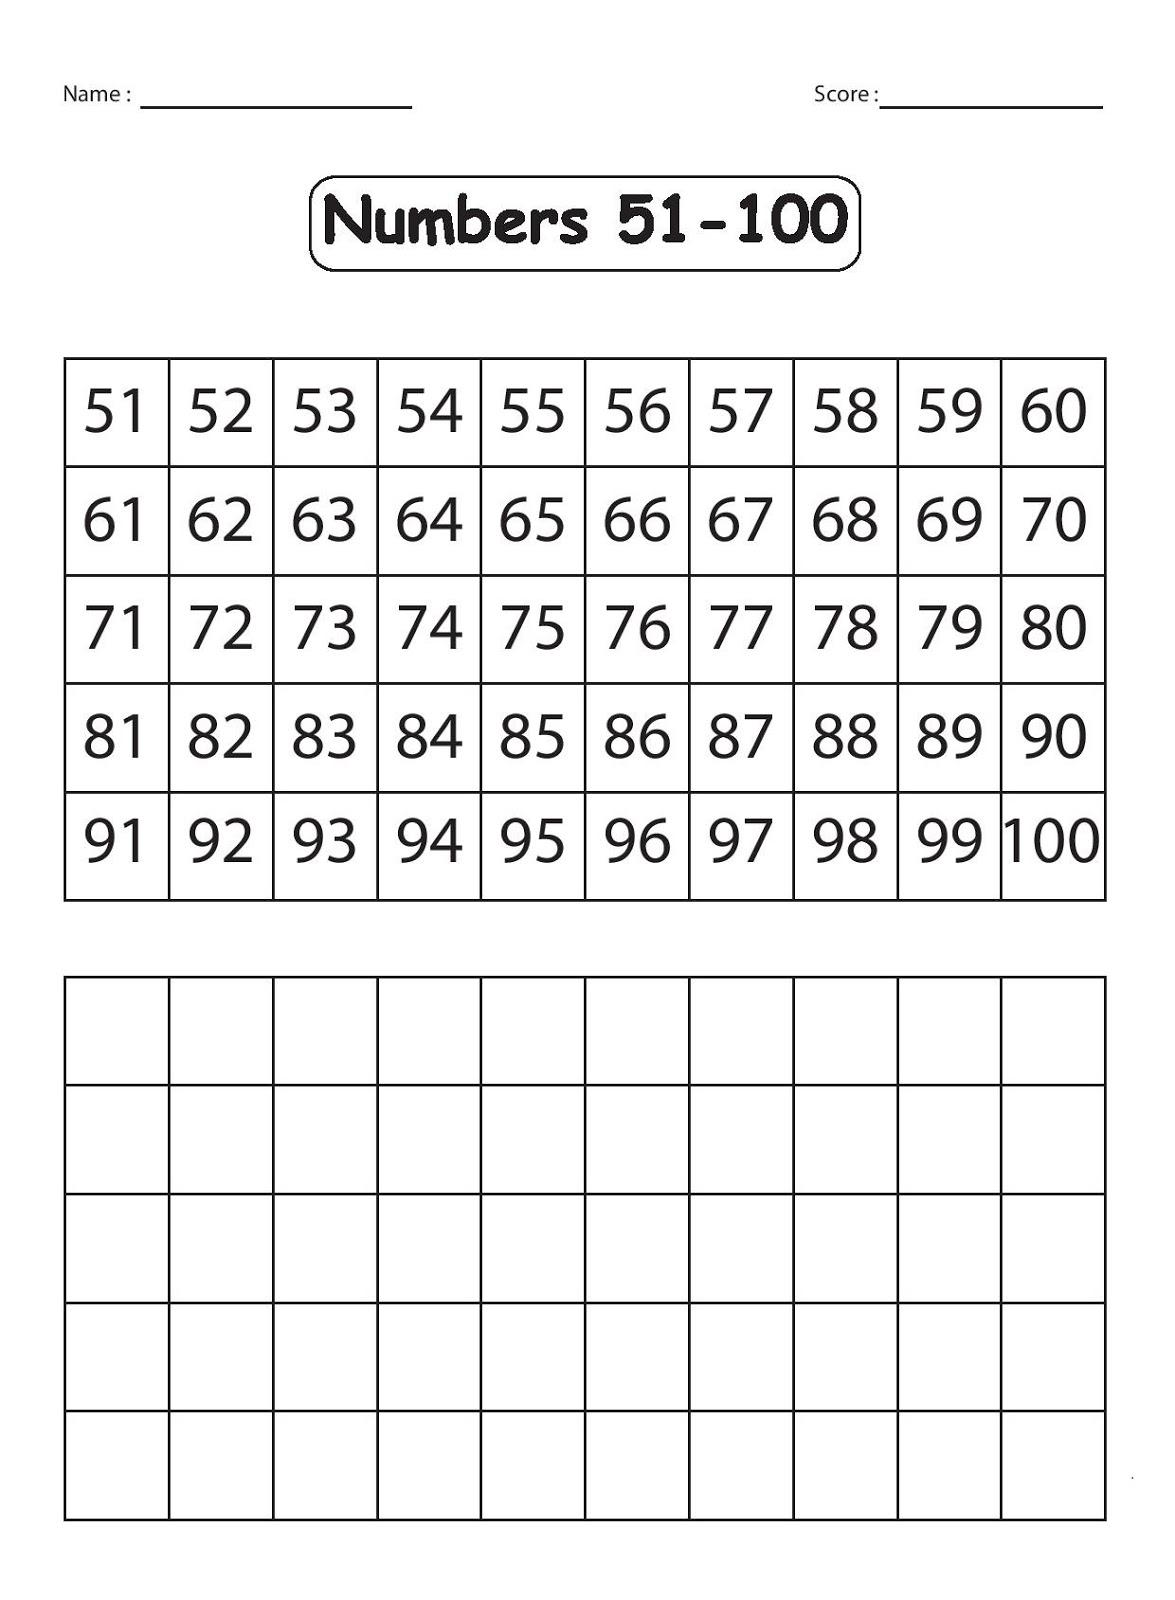 Workbooks kindergarten number worksheets 1-20 : Kindergarten Worksheets: Maths Worksheets - Explore the Numbers ...